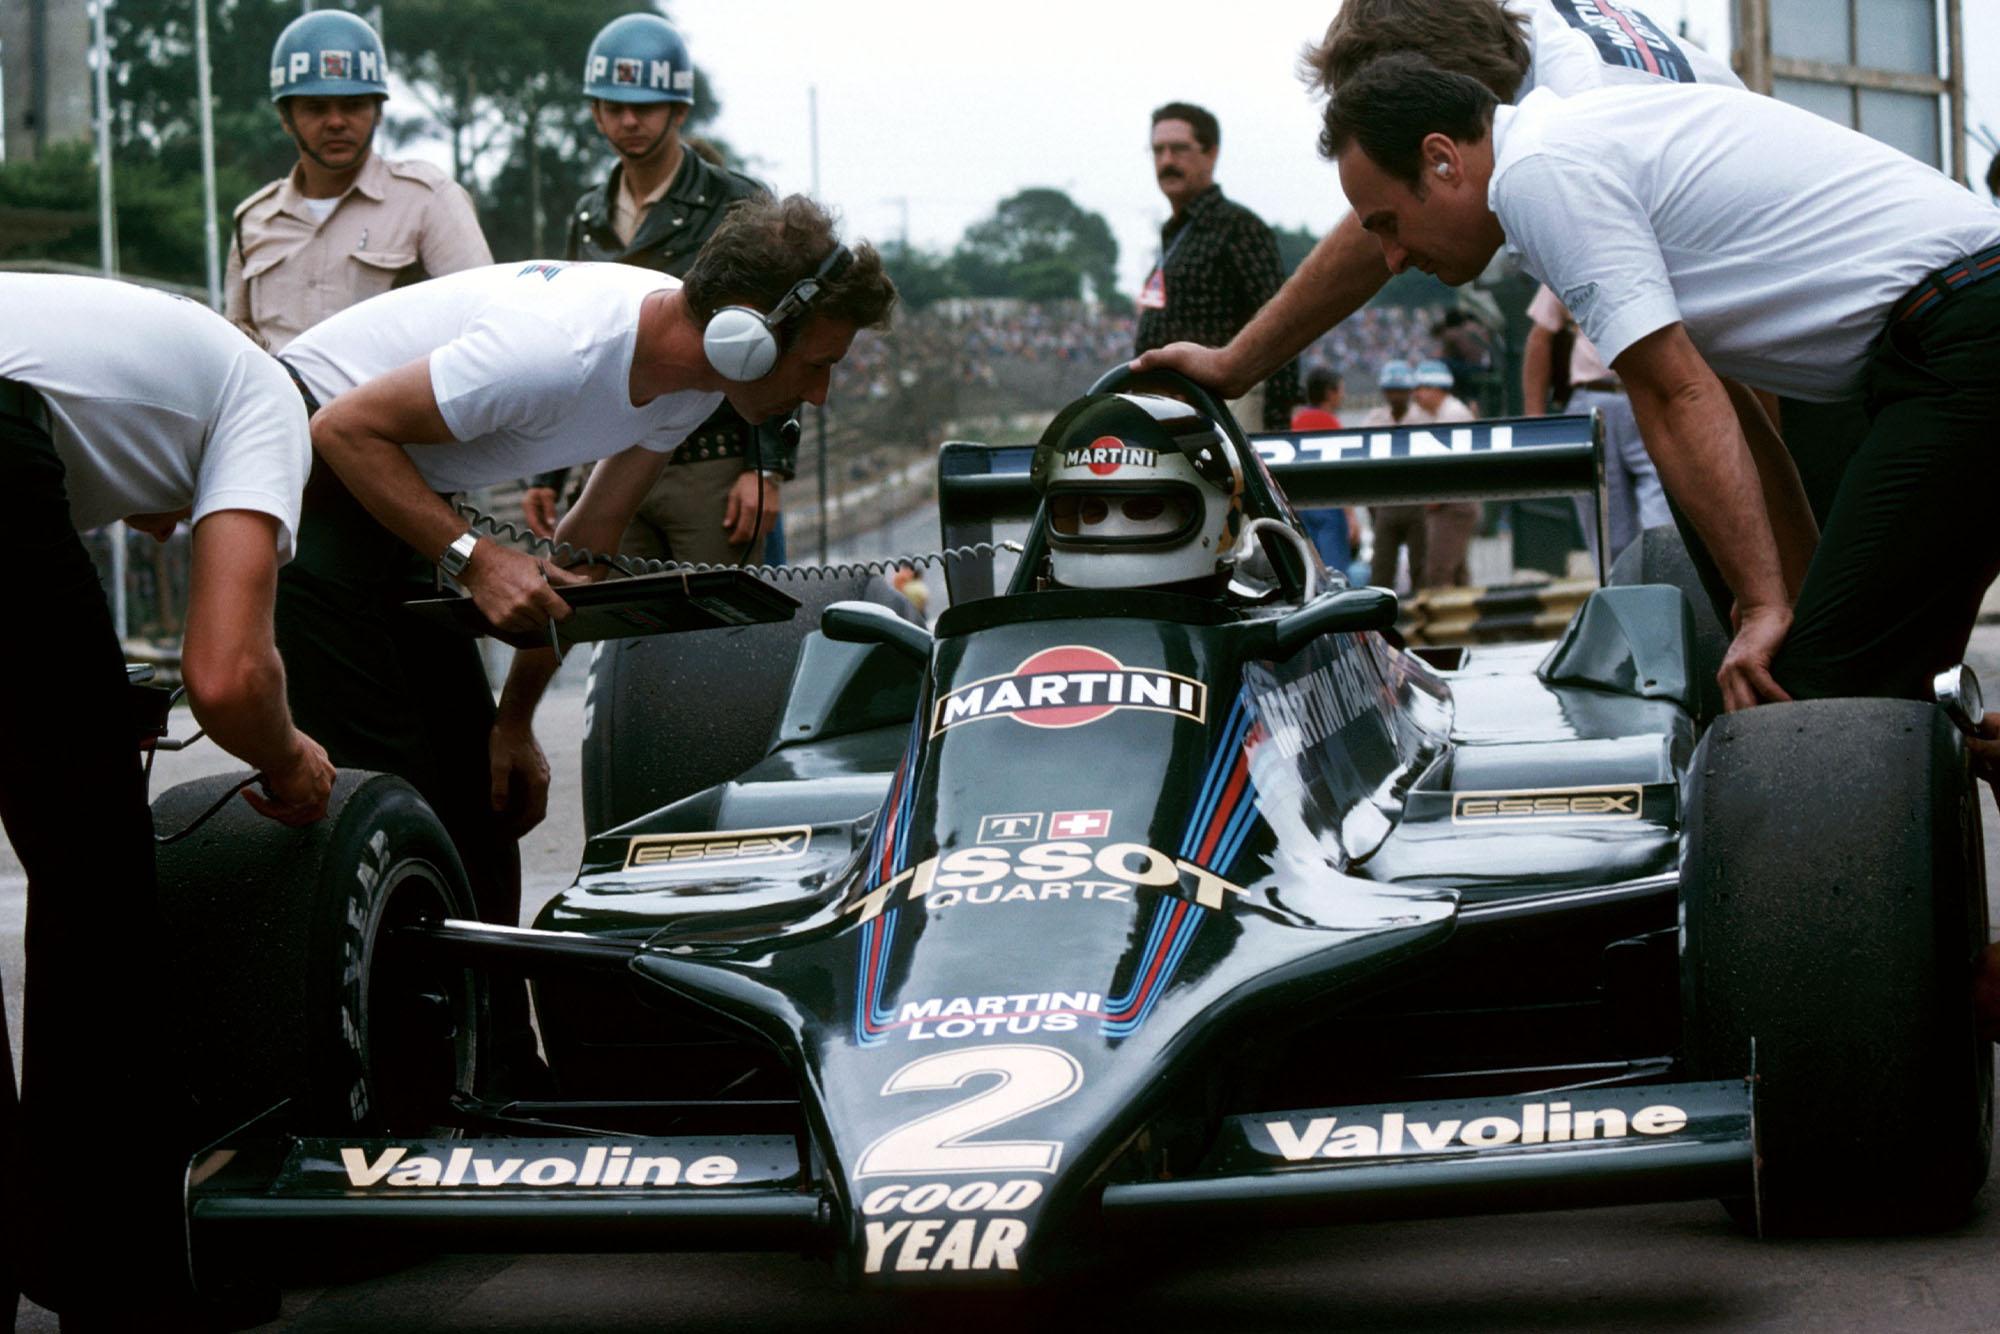 Carlos Reutemann (Lotus) at the 1979 Brazilian Grand Prix, Interlagos.